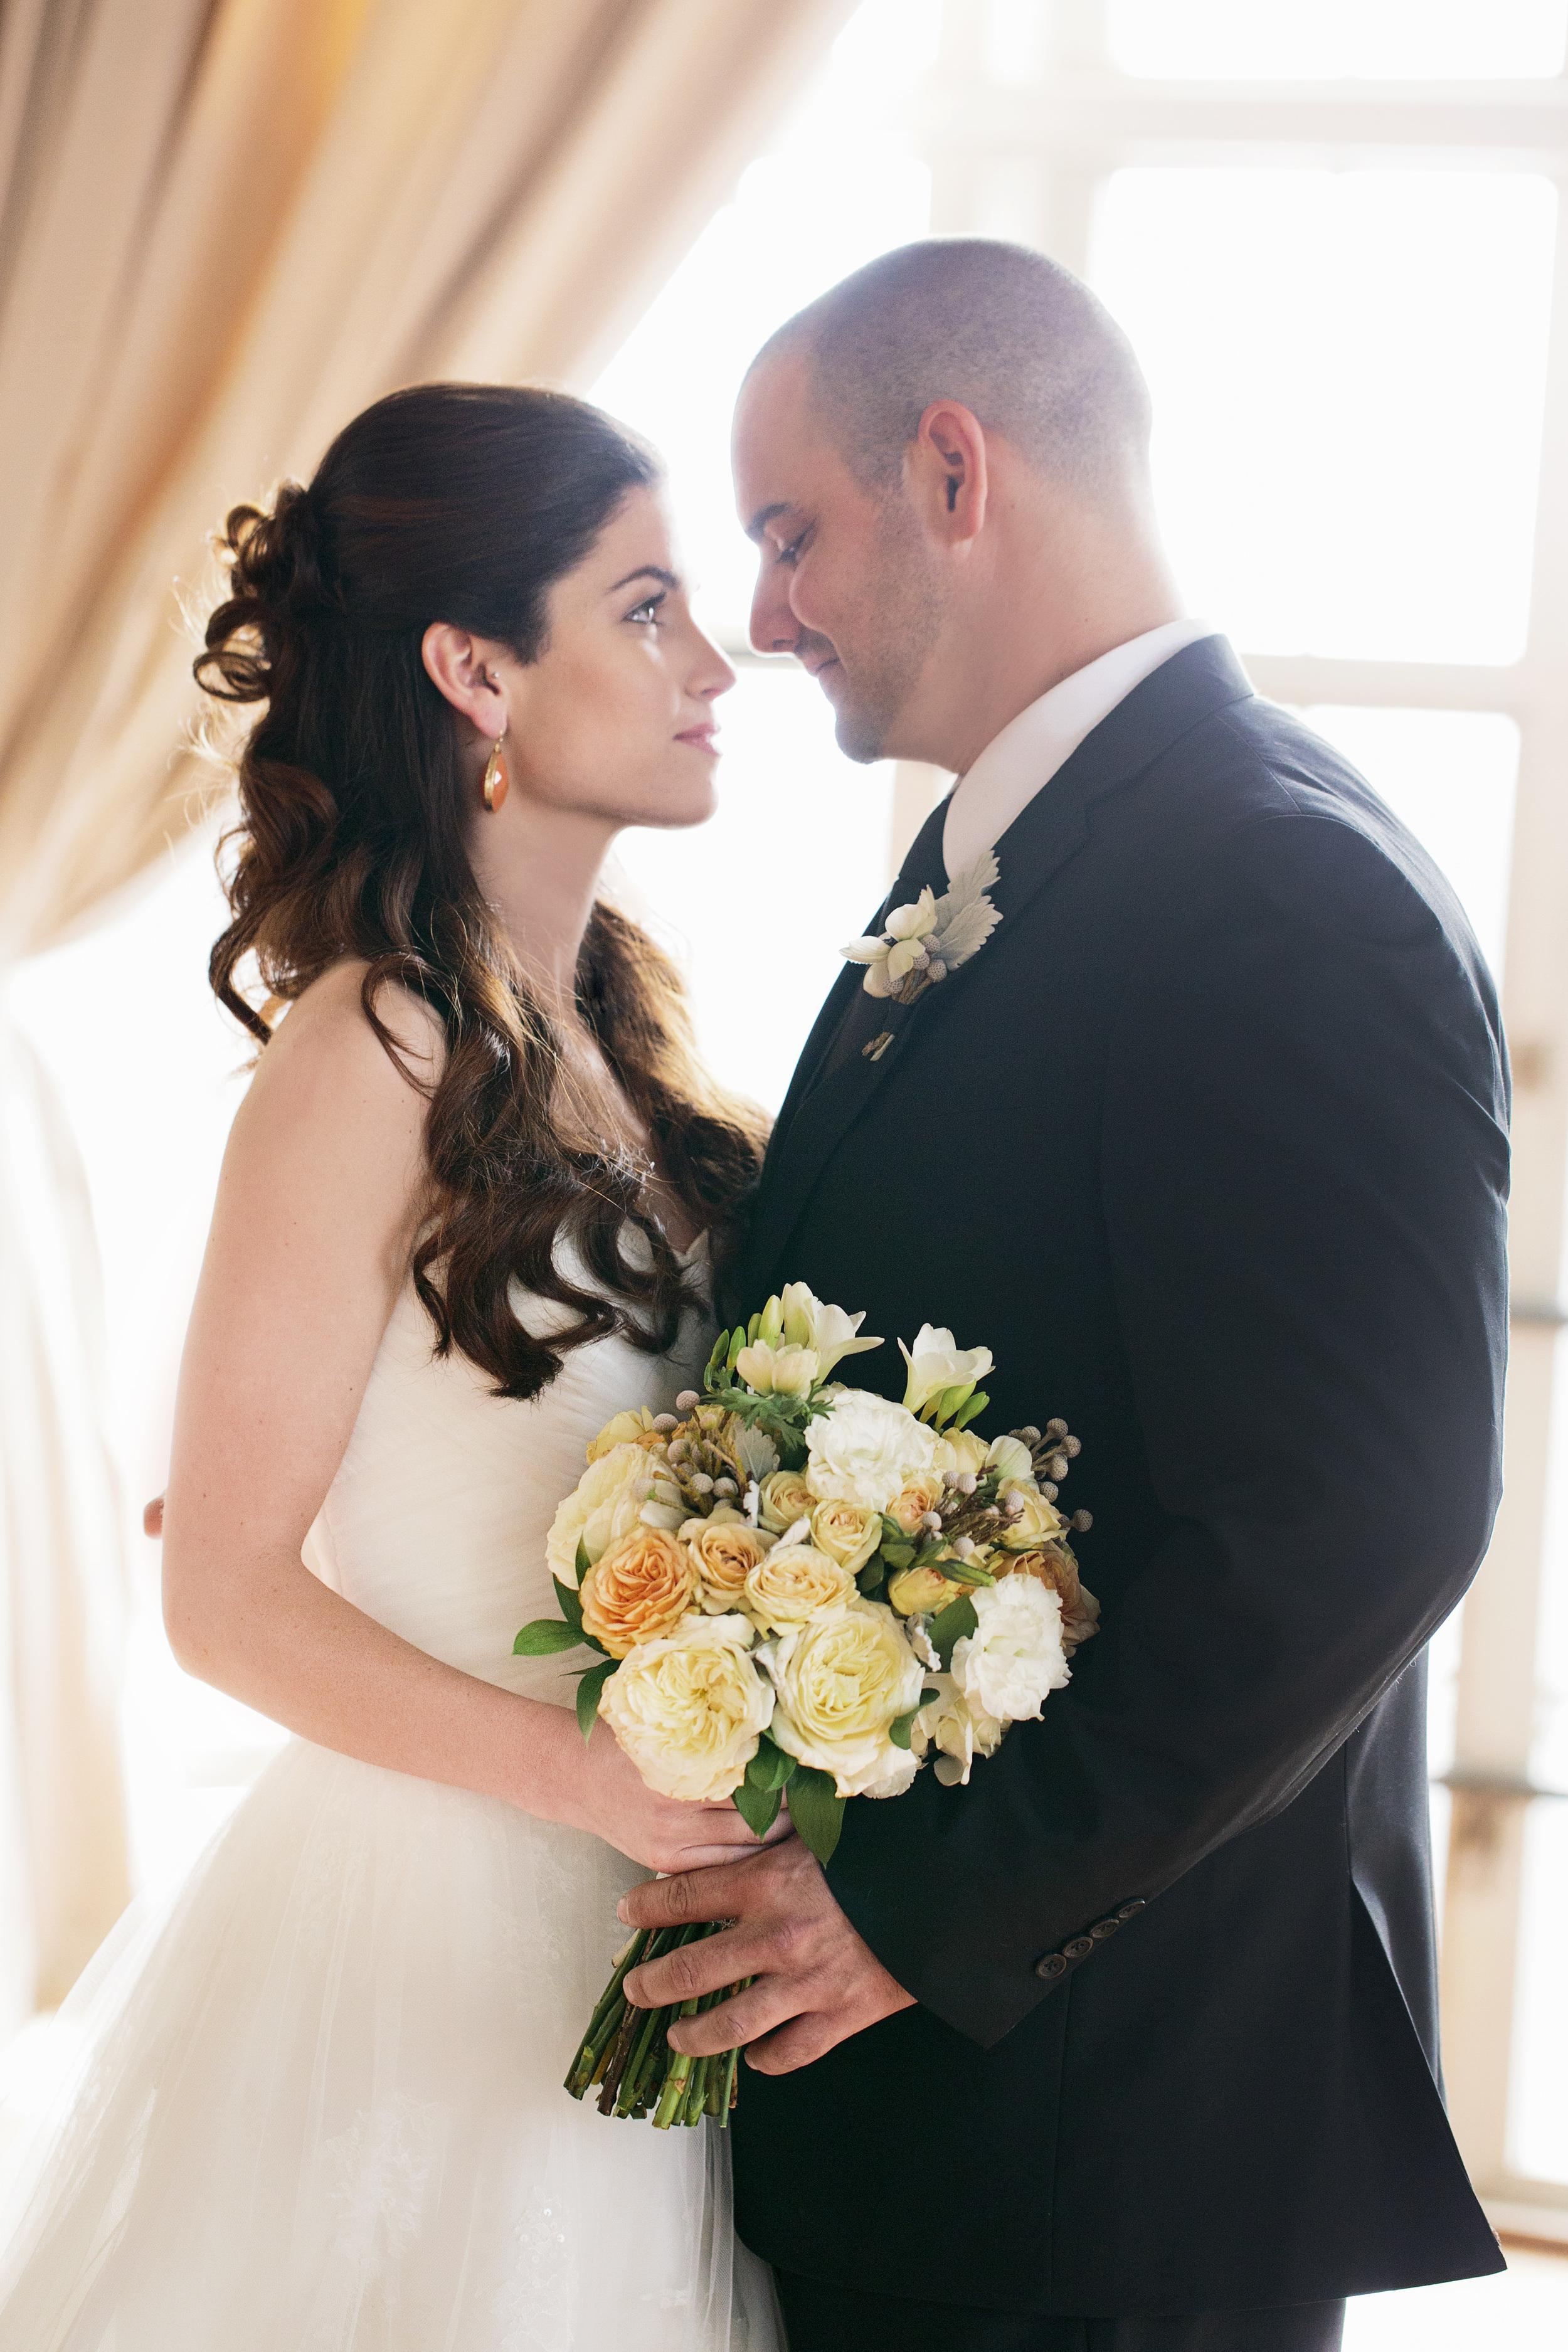 HNP_Opera-Delaware-Peach-Emerald-Wedding-Styled-Shoot_062.jpg